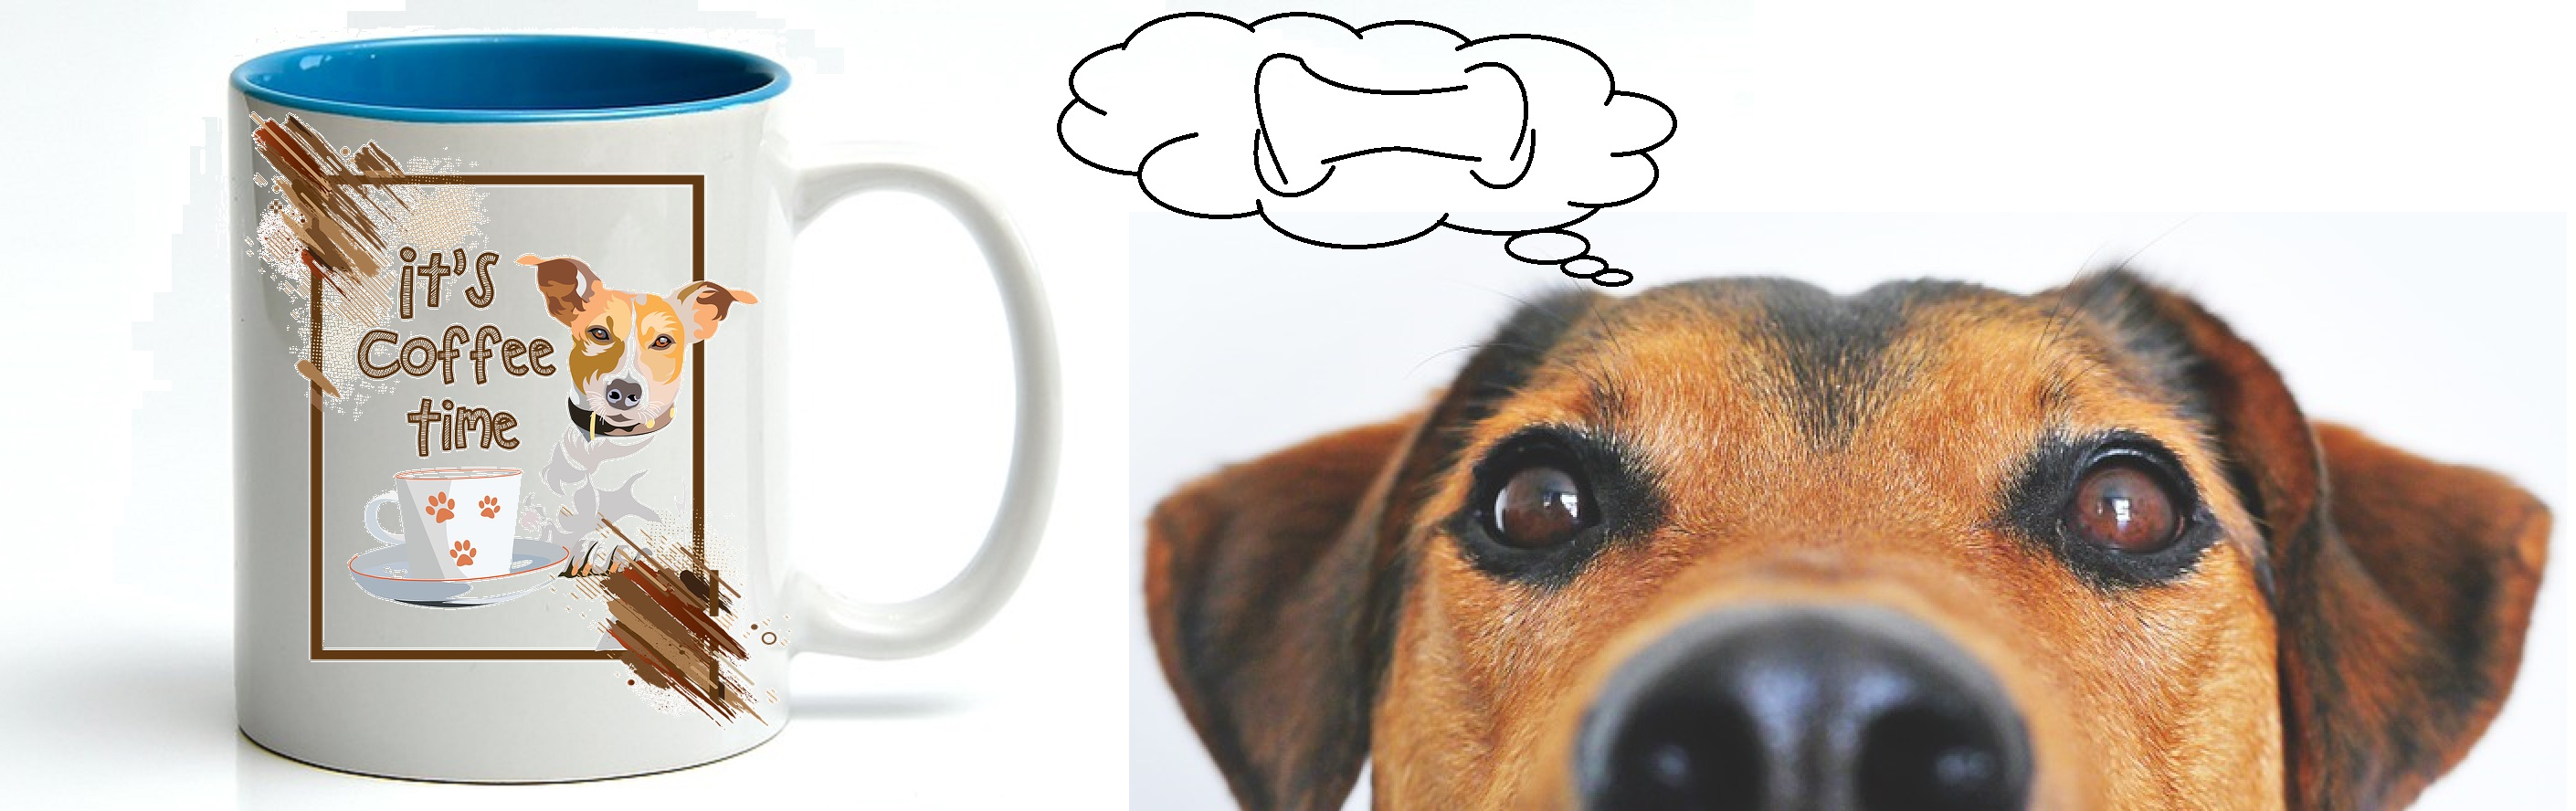 Hunde Tasse, Hundetasse, Hunderasse, Hunderassen, Hundetassen, Hunde Tassen, Hund, Kaffeetasse, Teetasse, Kaffeetassen, Teetassen